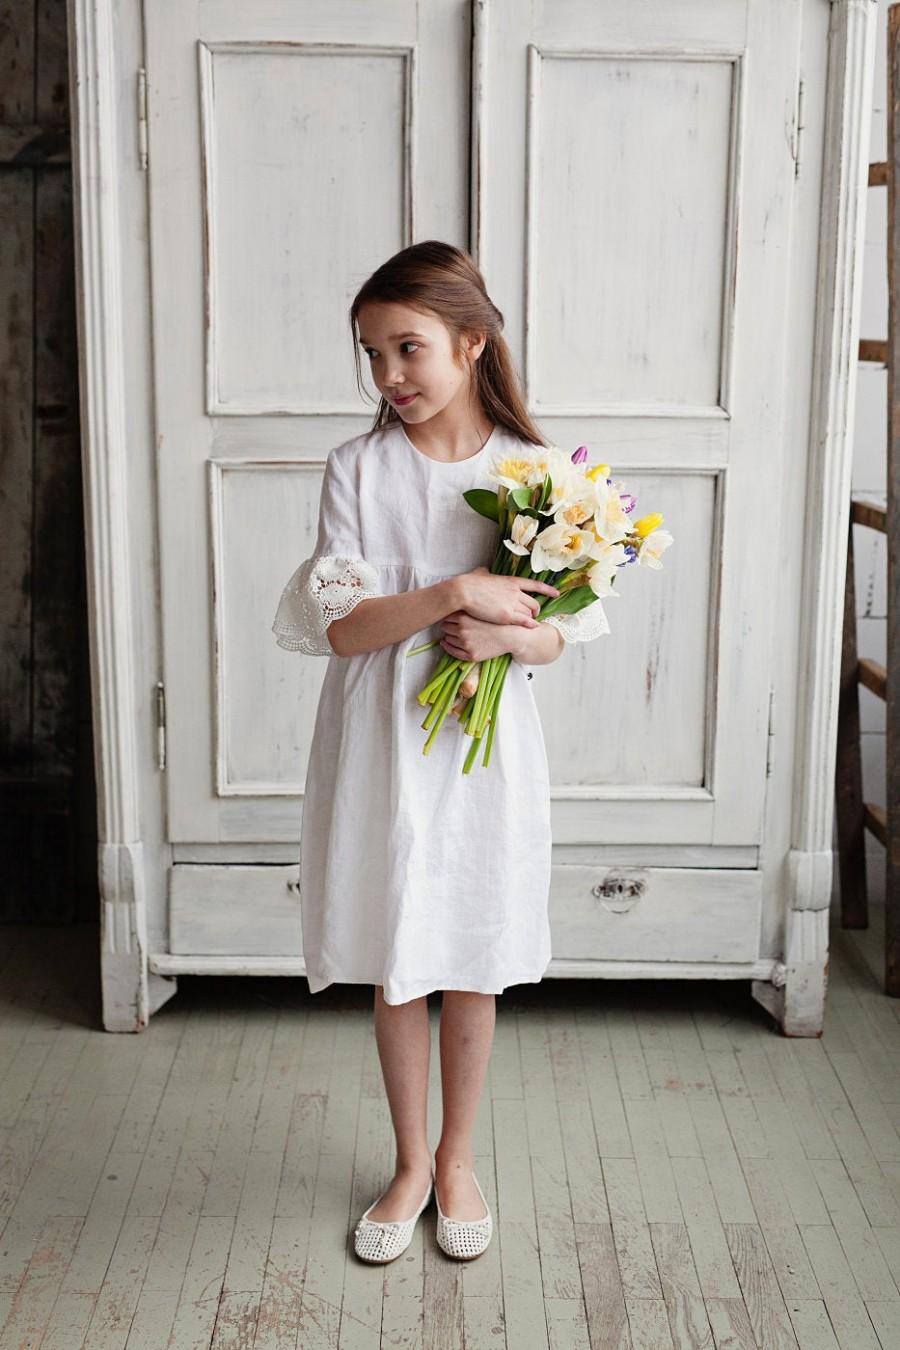 Mariage - White flower girl dress with bell sleeves, white summer dress, linen dress for girls, toddler wedding dress, washed linen girl dress